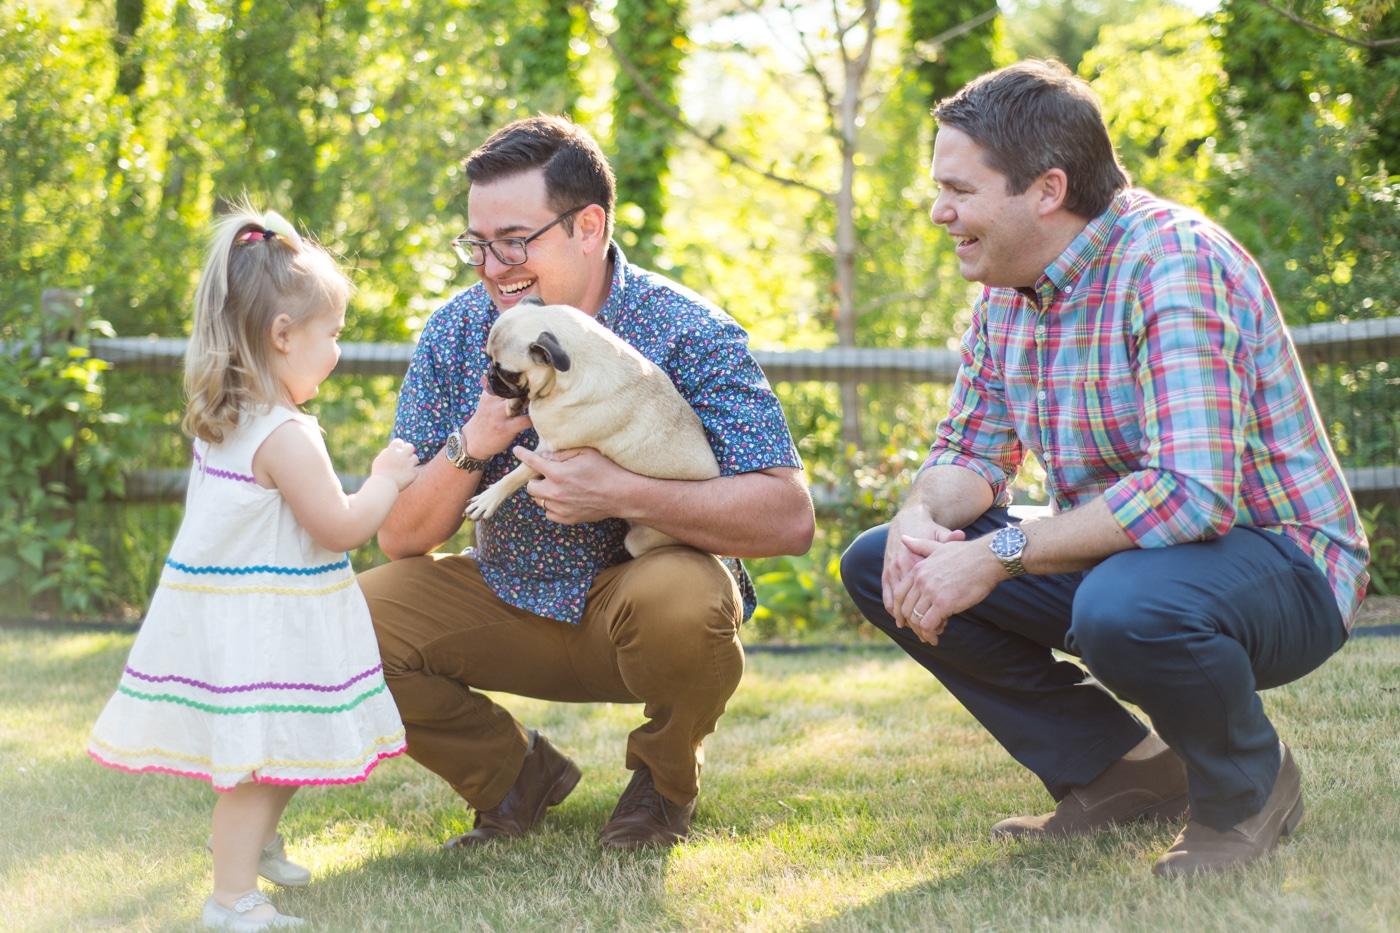 Jack, Gary, & Frankie // Atlanta Family Portraits in a Backyard